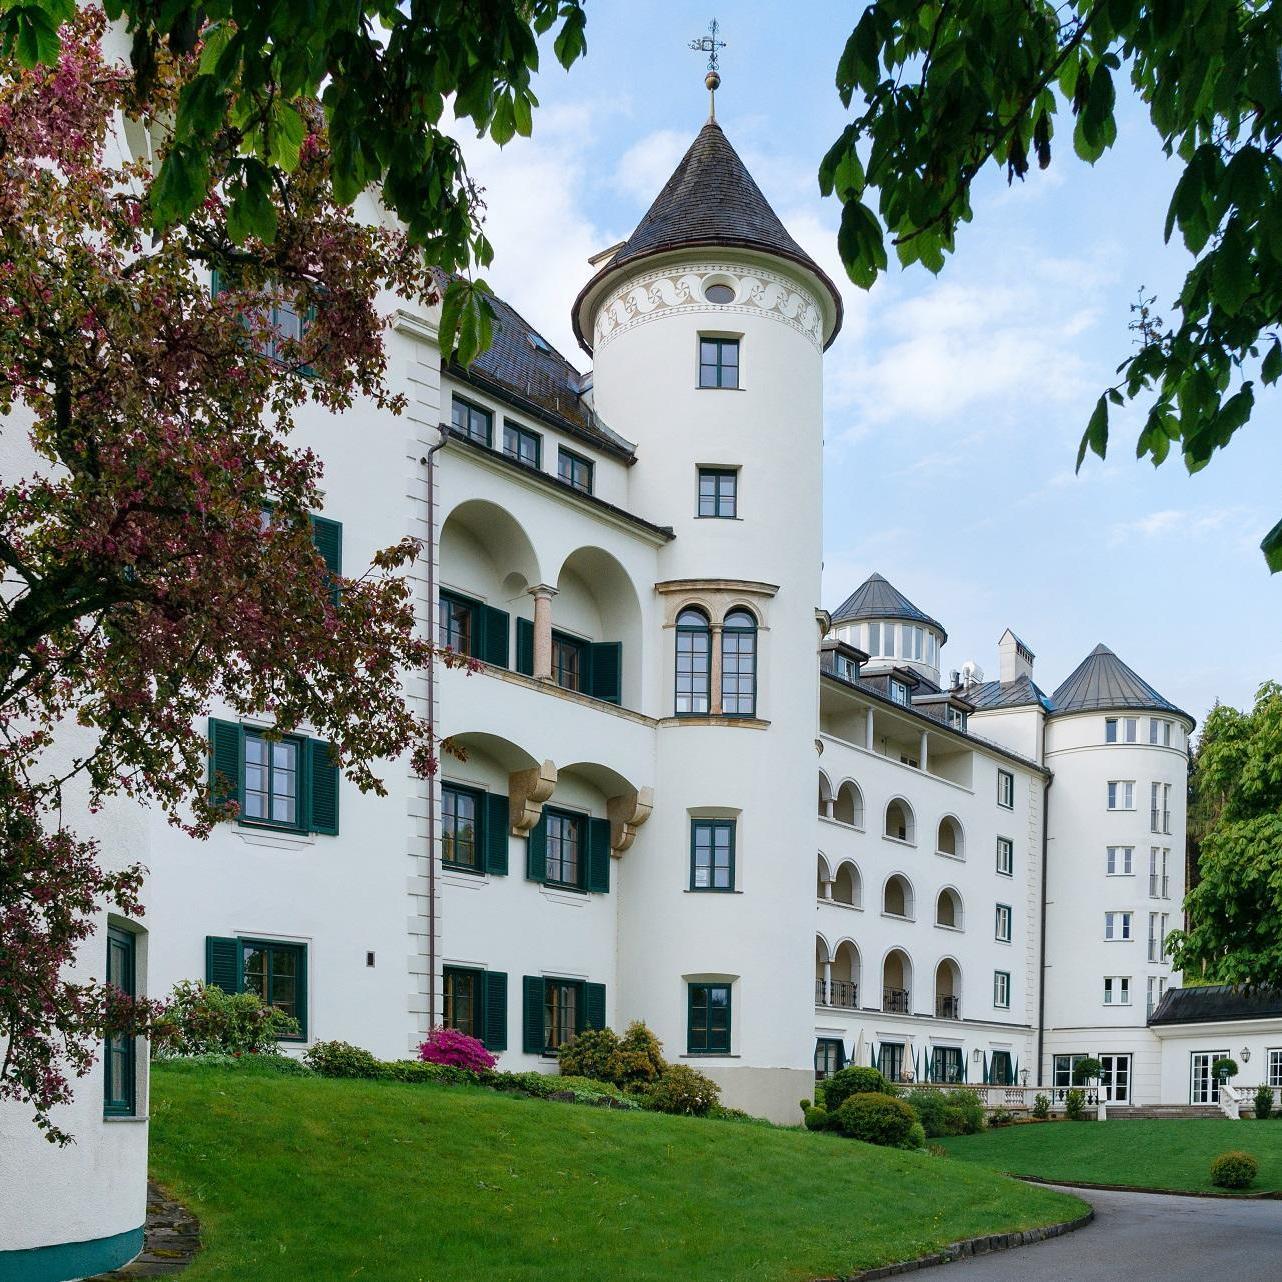 Schloss Pichlarn Hotel building in Austria